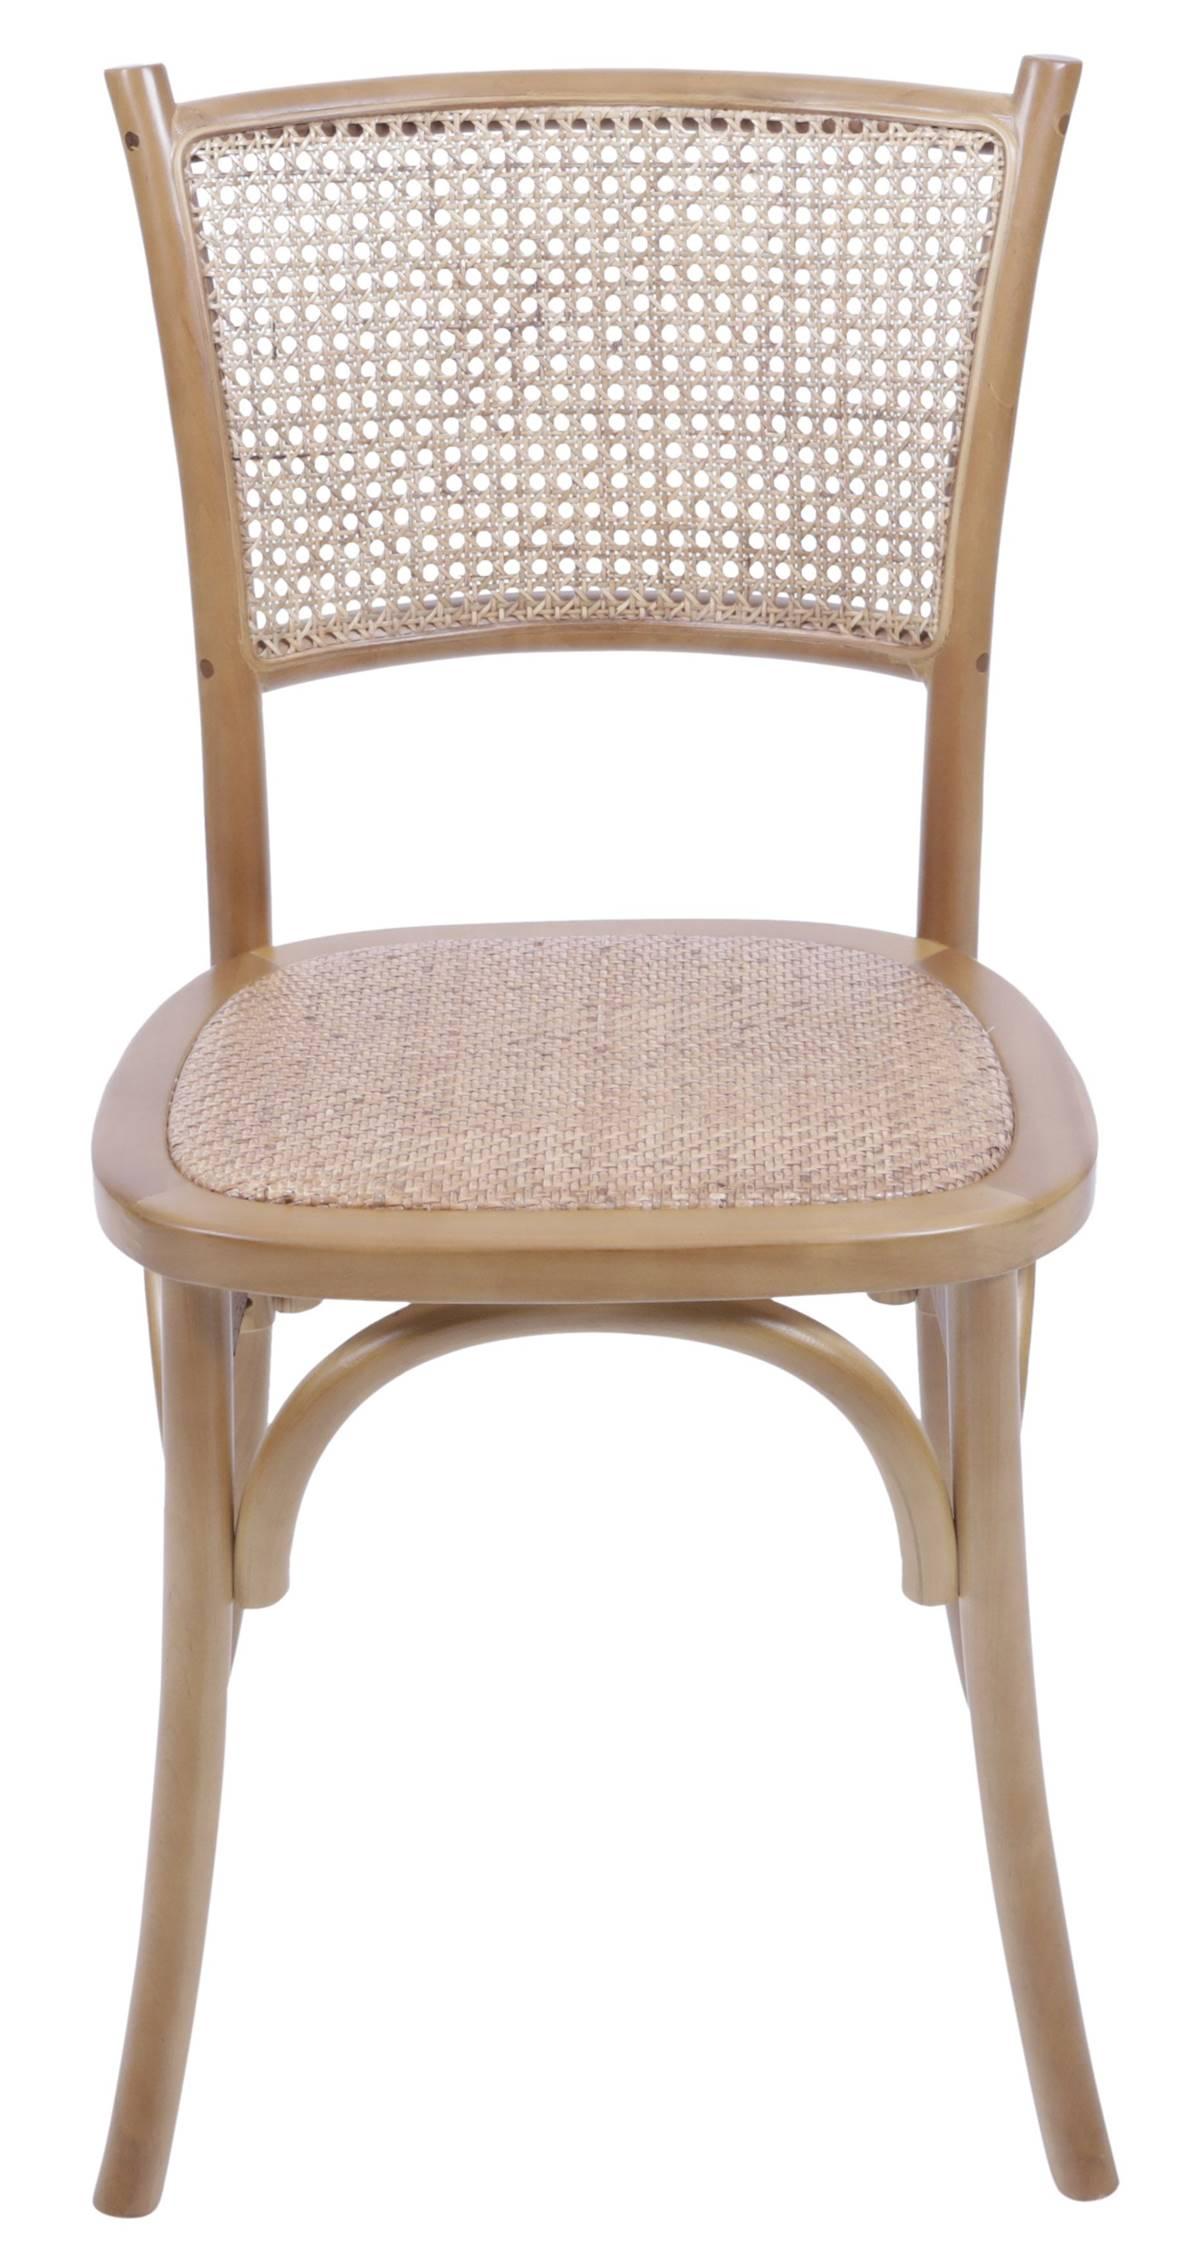 Cadeira Zimba Madeira Clara Assento em Rattan - 55489